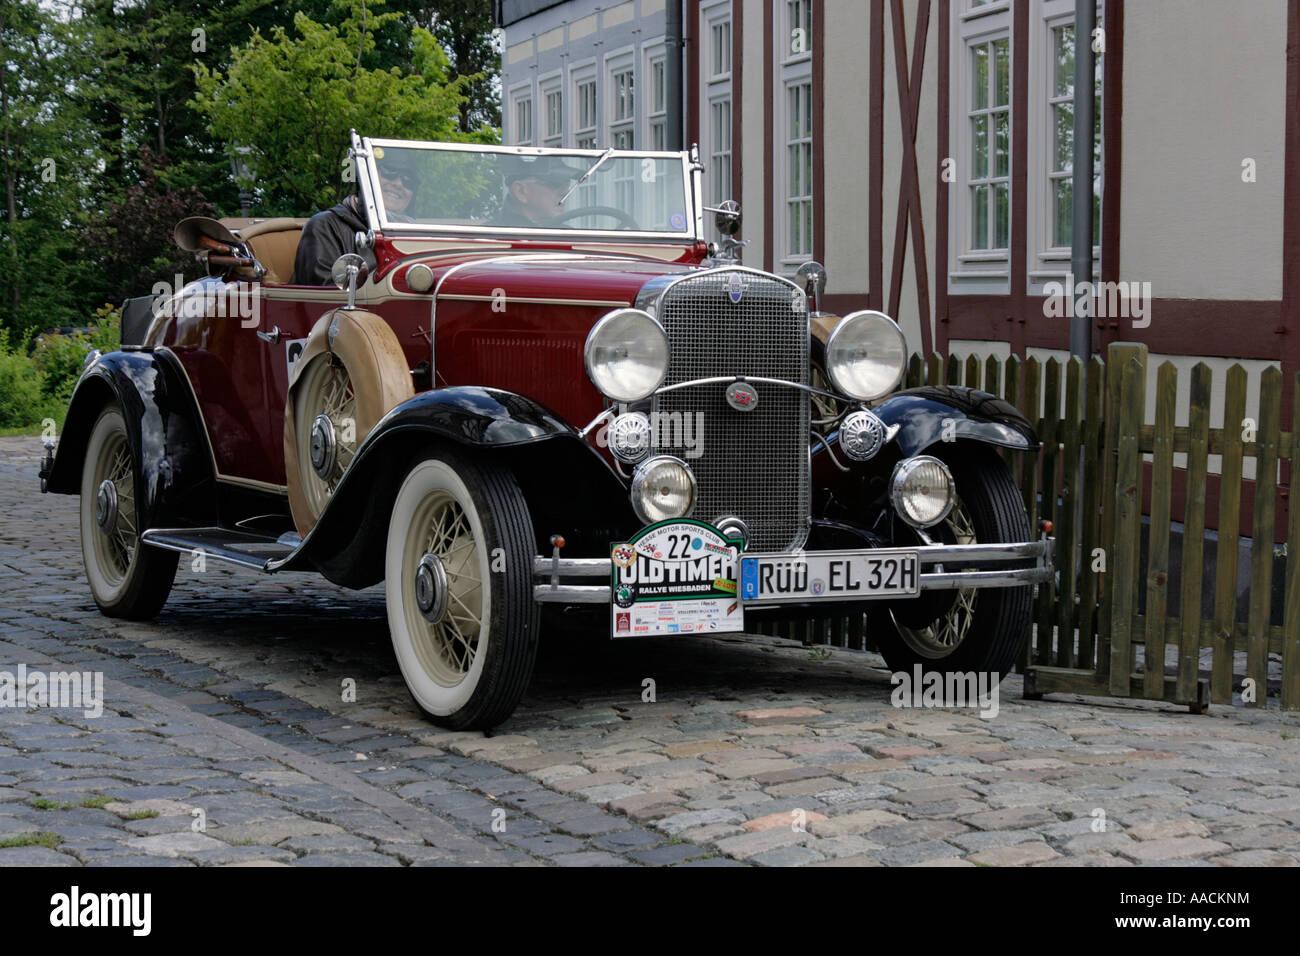 Vintage car Chevrolet Convertible Roadster of 1931, vintage car race ...